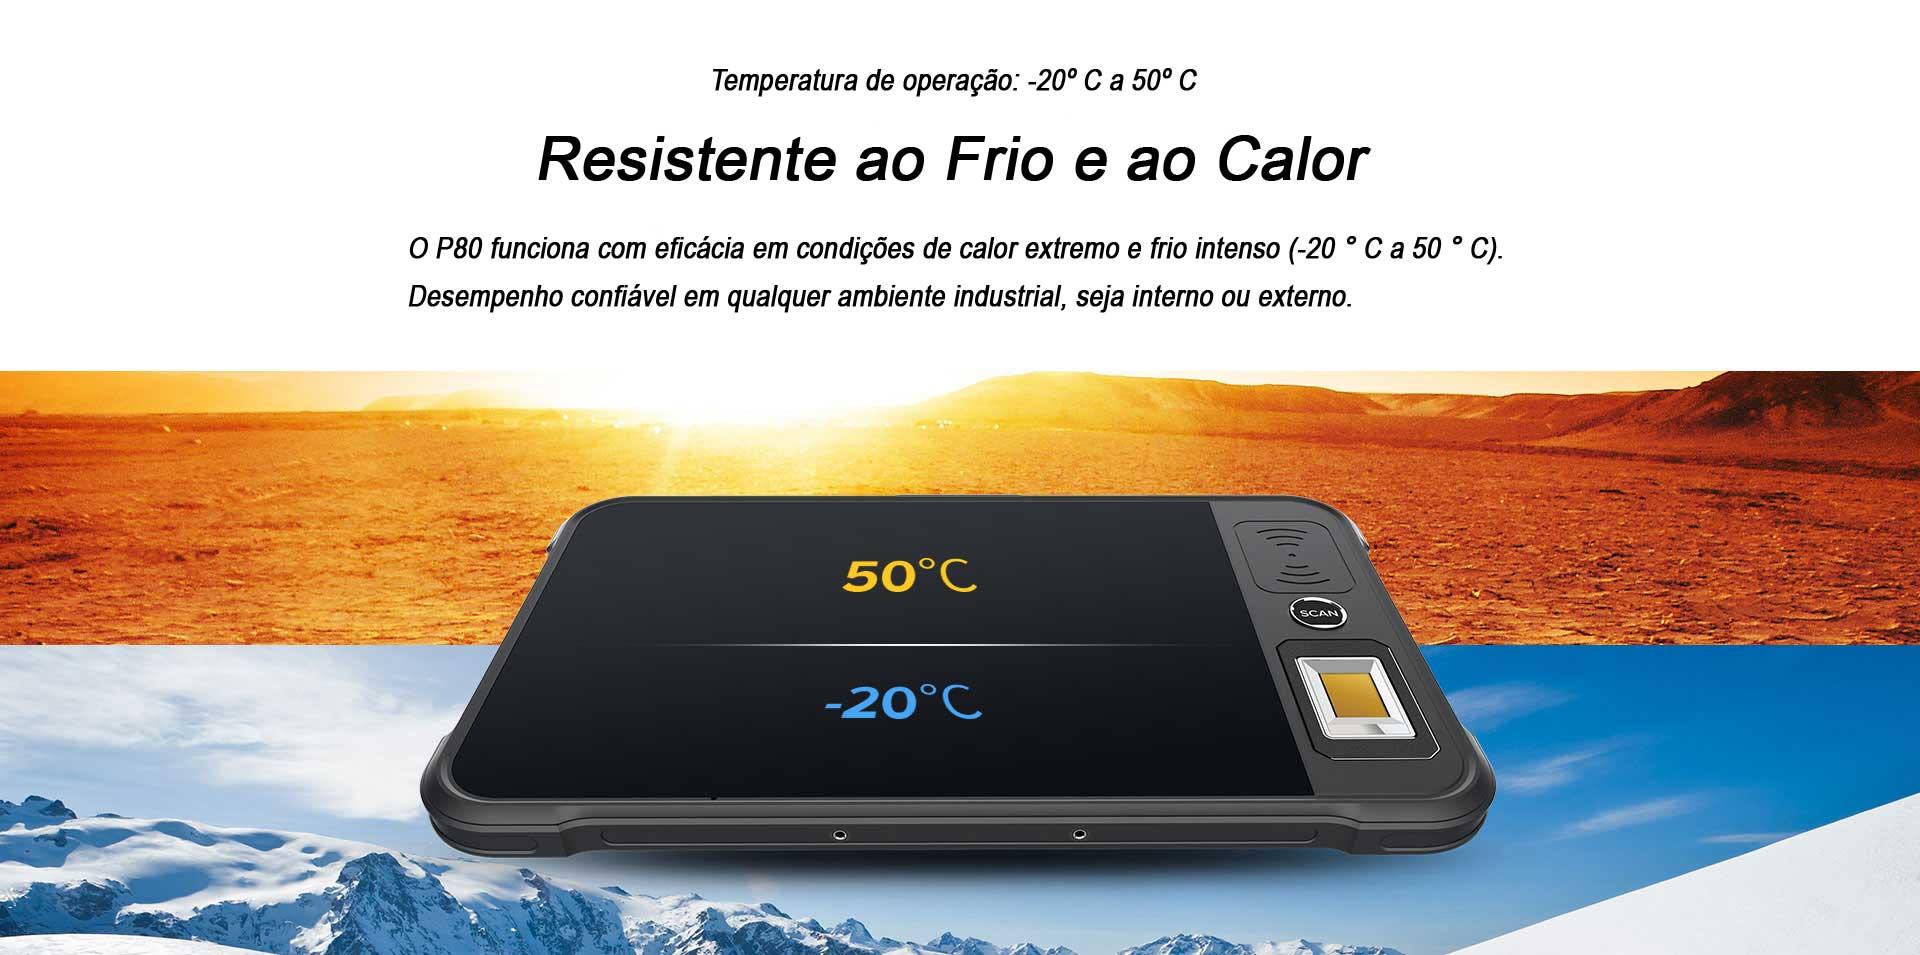 TABLET INDUSTRIAL P80 CHAINWAY FRIO E CALOR